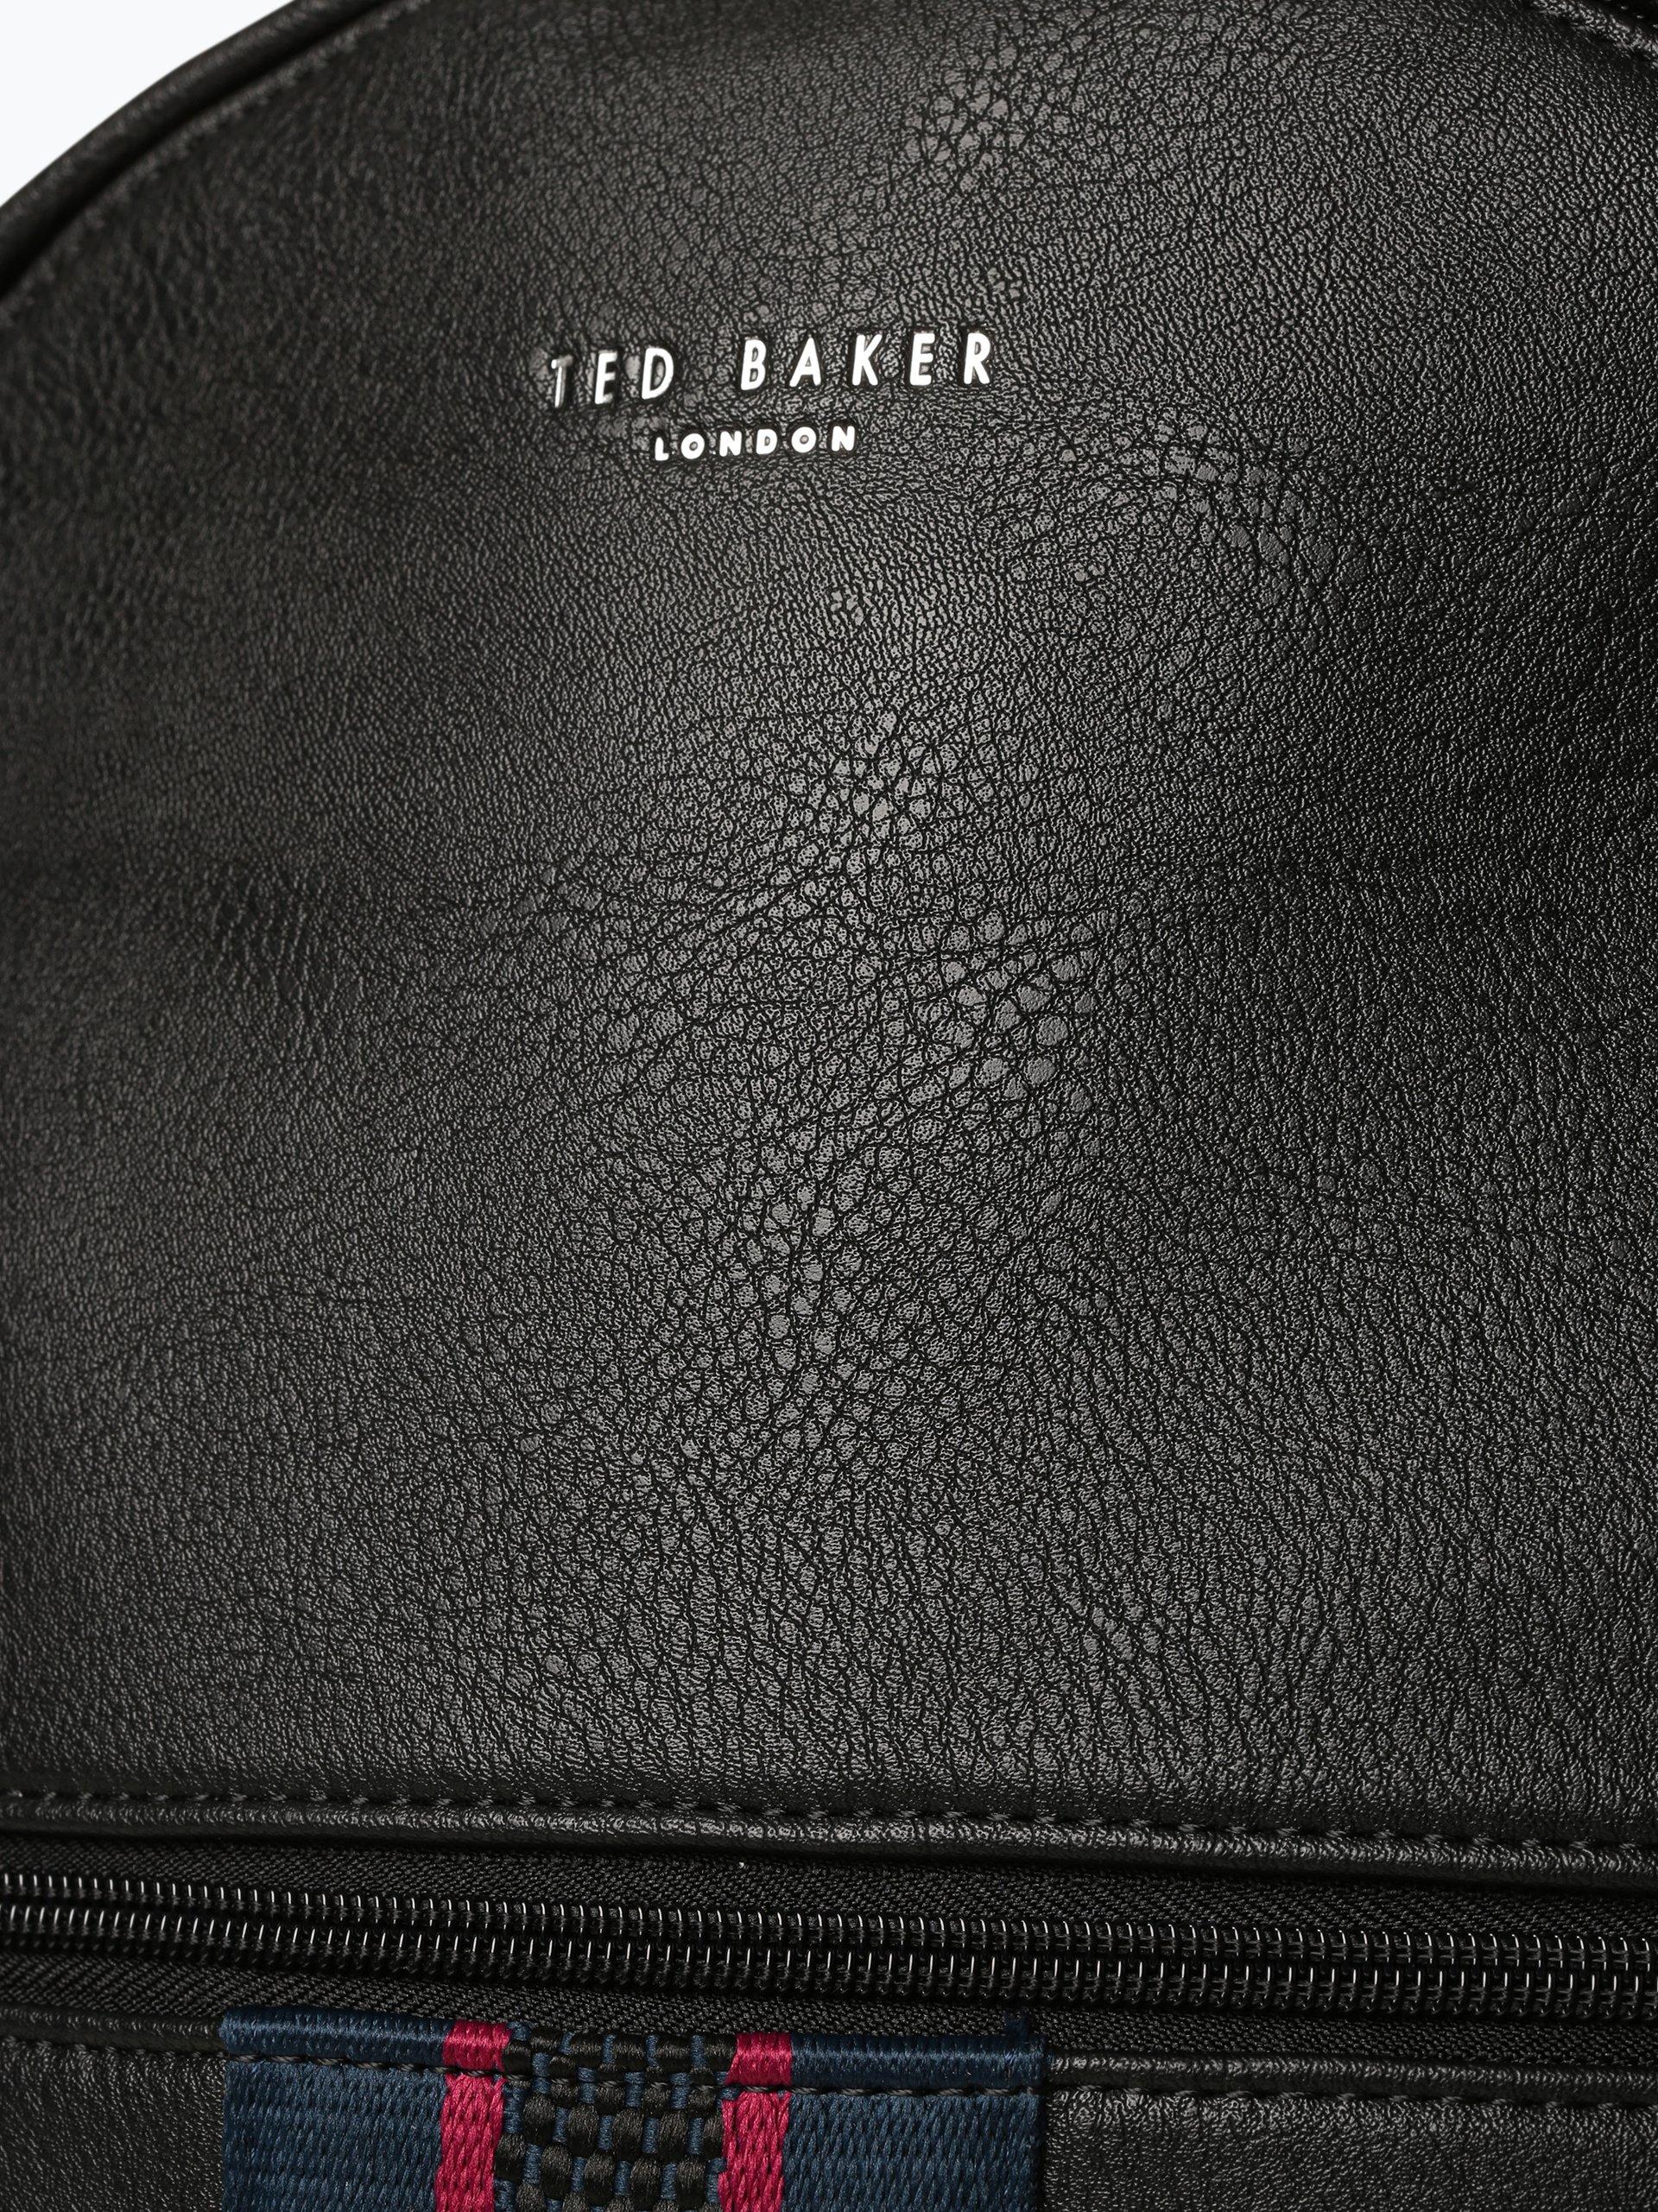 Ted Baker Plecak męski